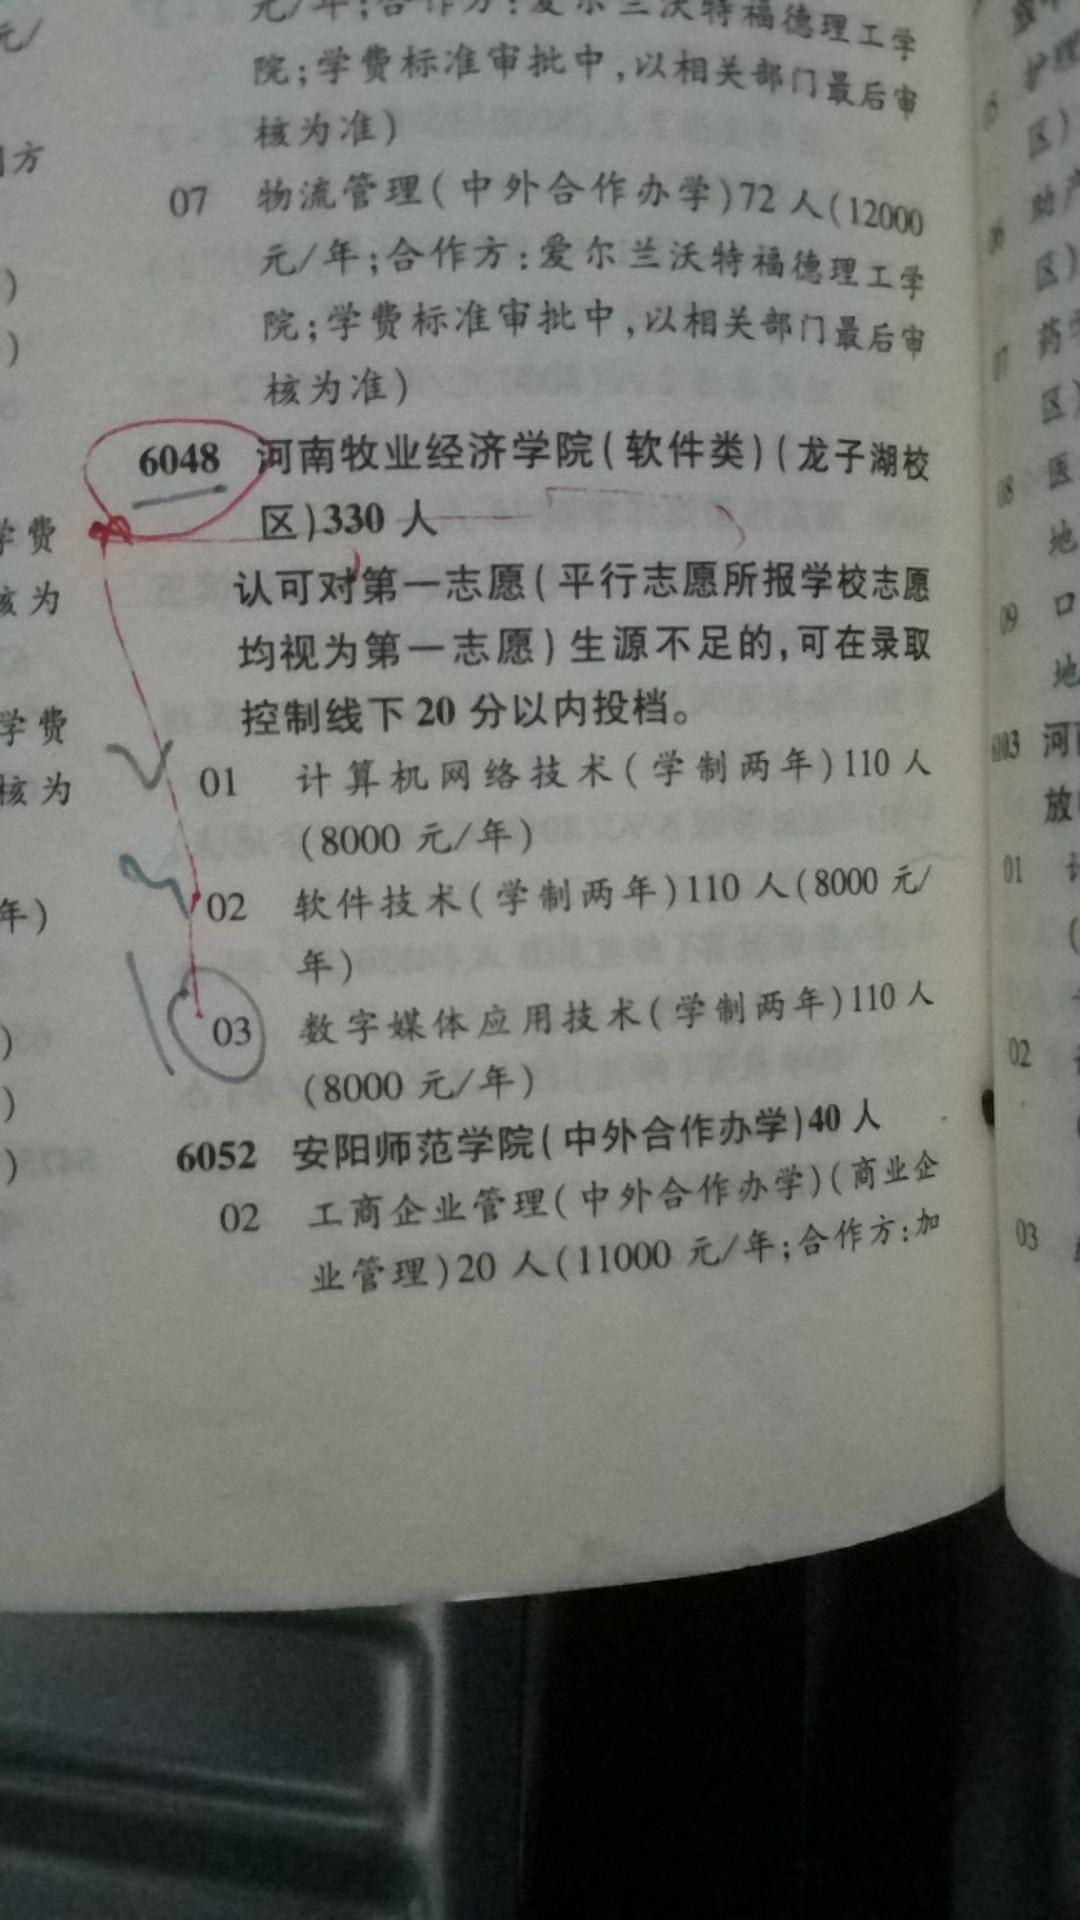 <b>河南一高校录取时临时变更校区被指虚假招生,学校回应:合规</b>